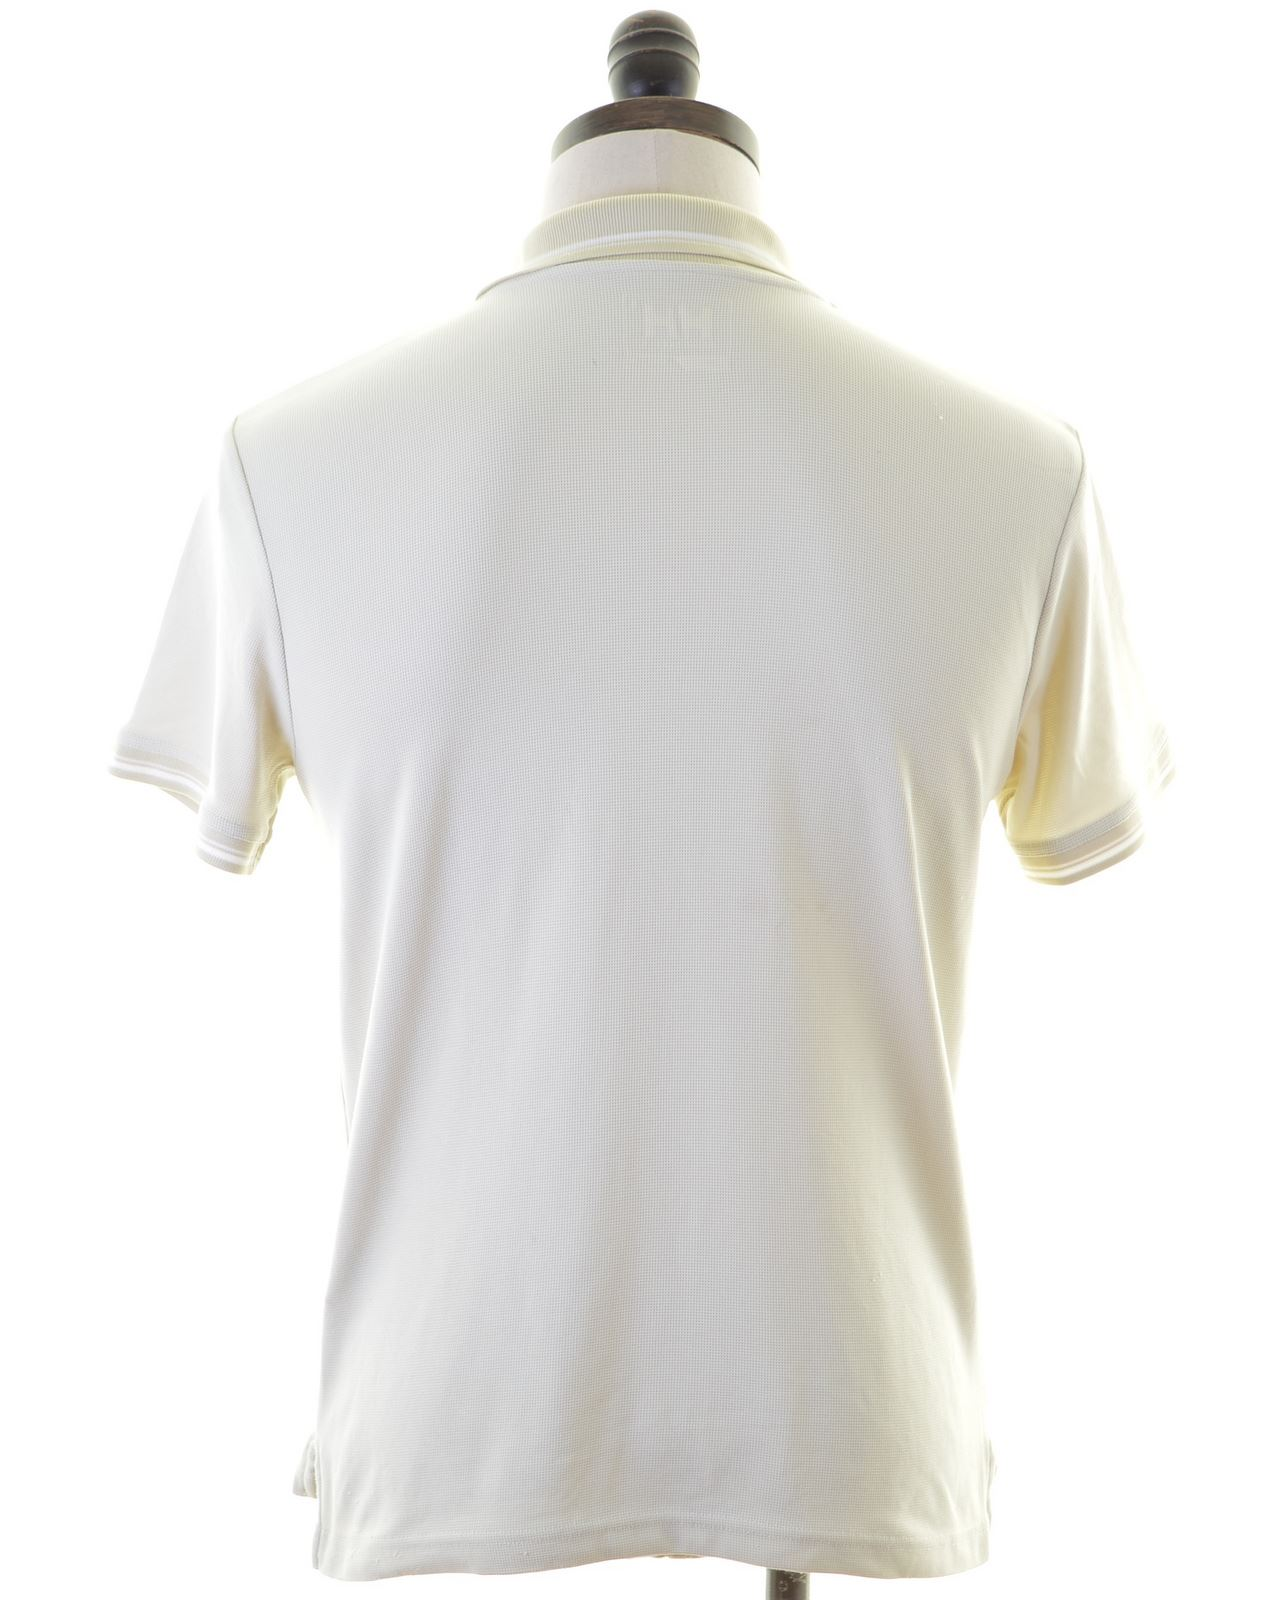 076c6c6c HELLY HANSEN Mens Polo Shirt Small Beige Polyamide CY17 | eBay